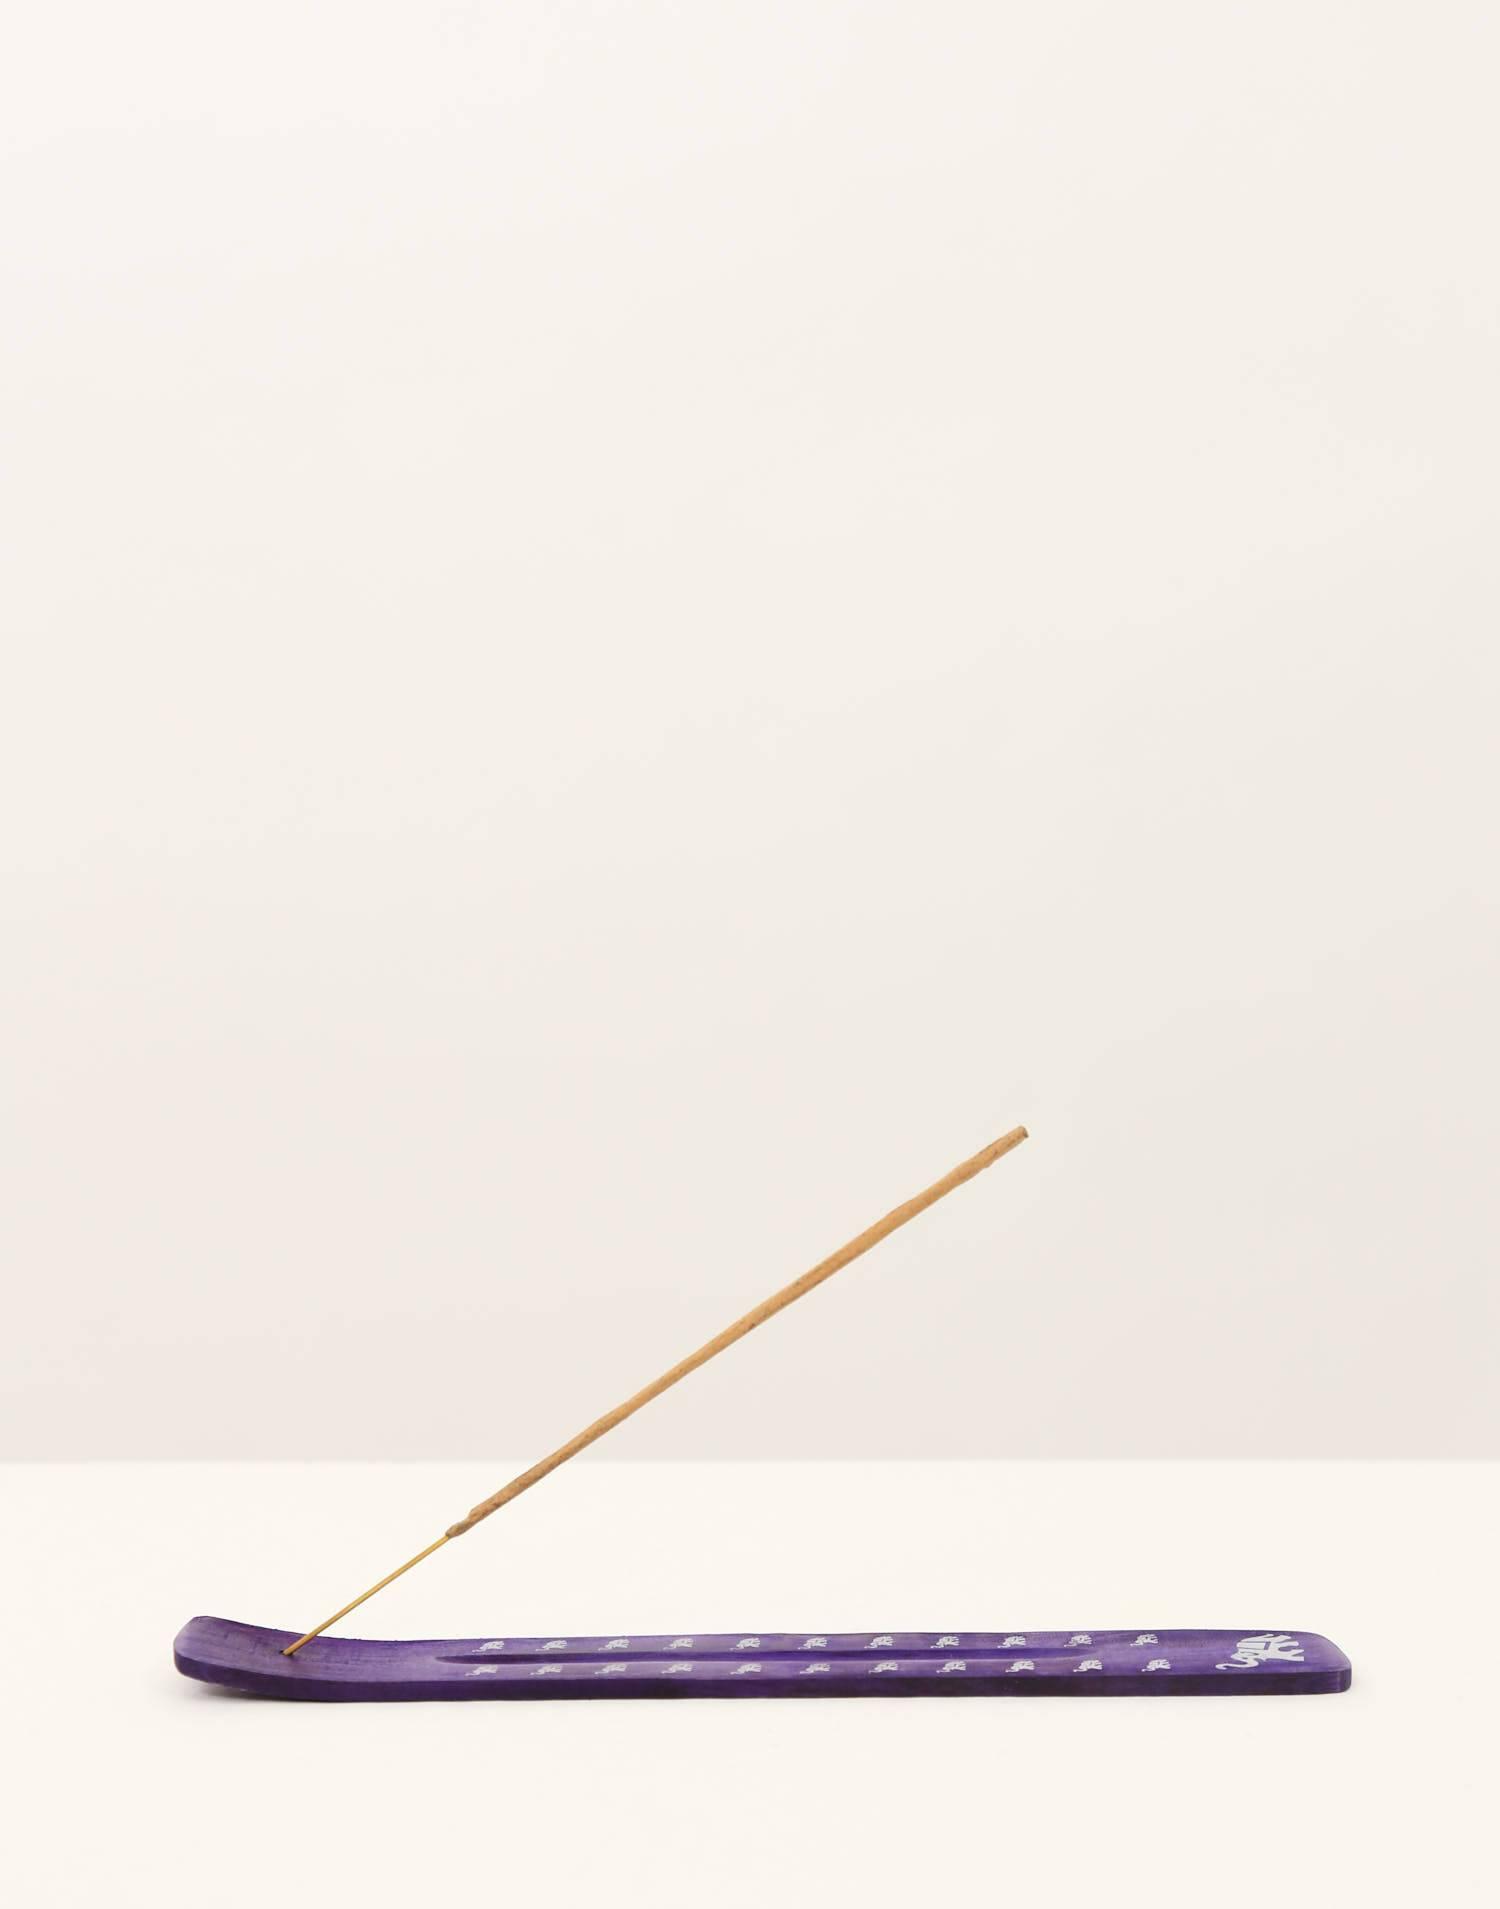 Mango incense holder